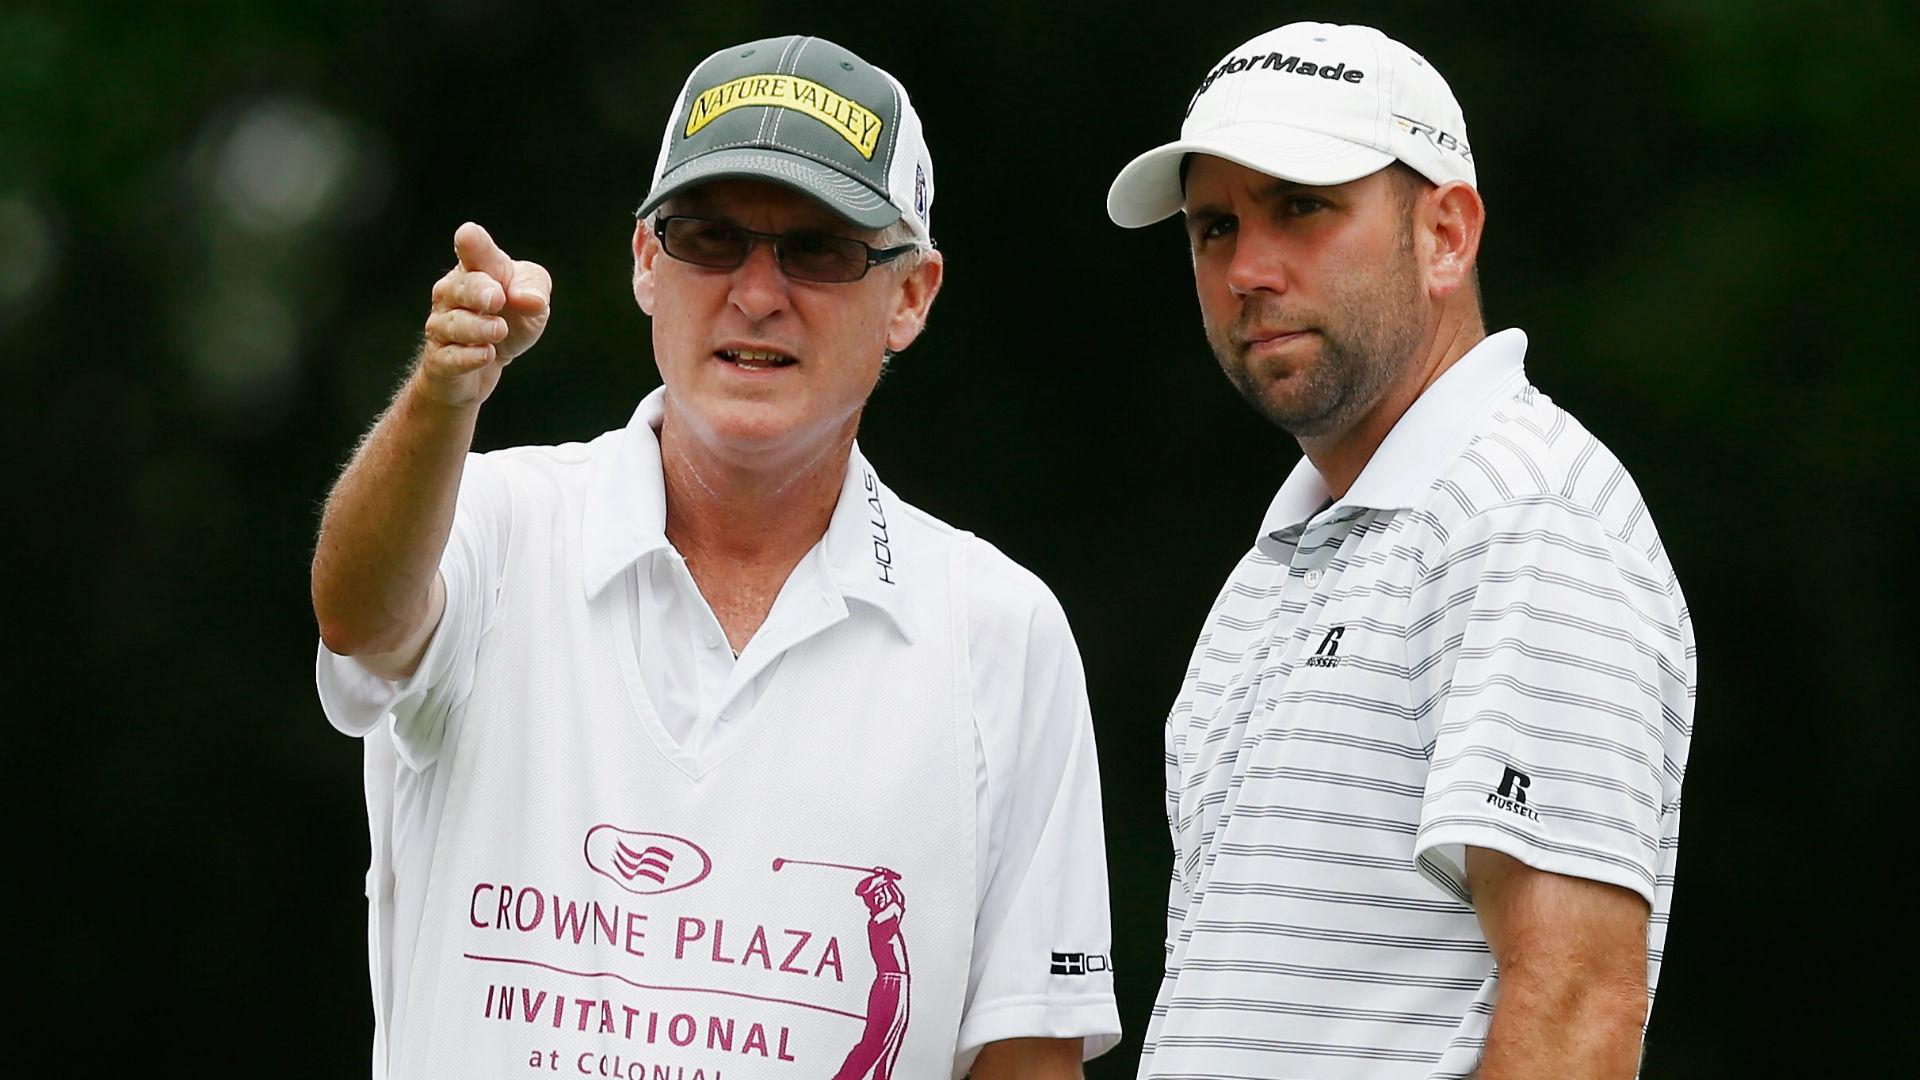 Former PGA Tour caddie Mike Hicks (left) with Josh Teater